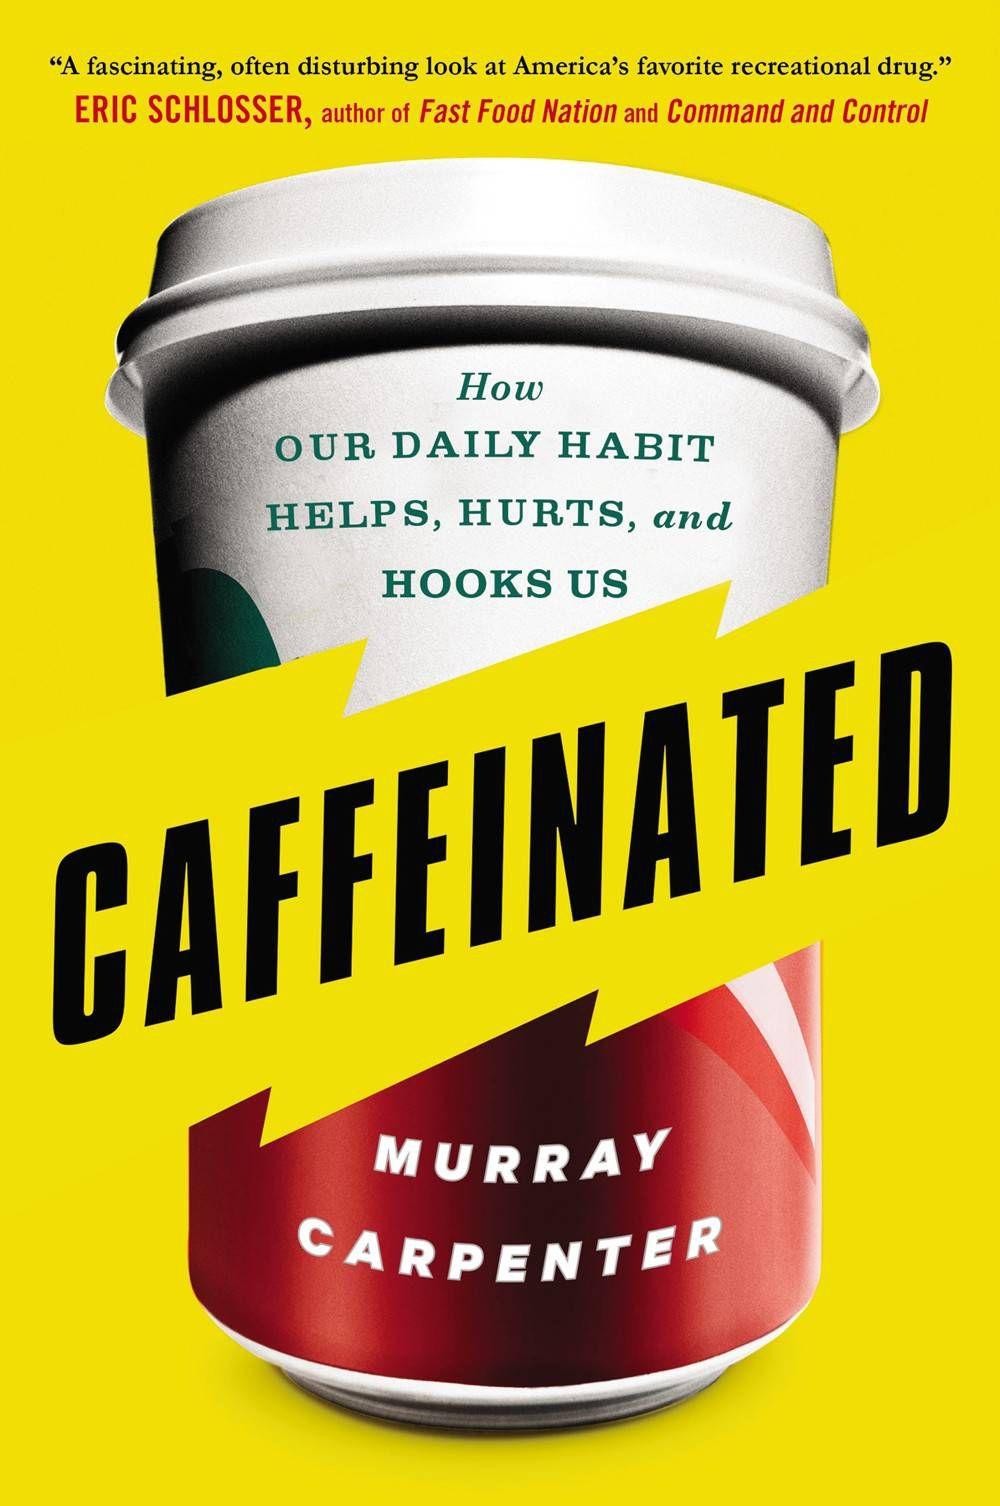 caffeinated - murray carpenter